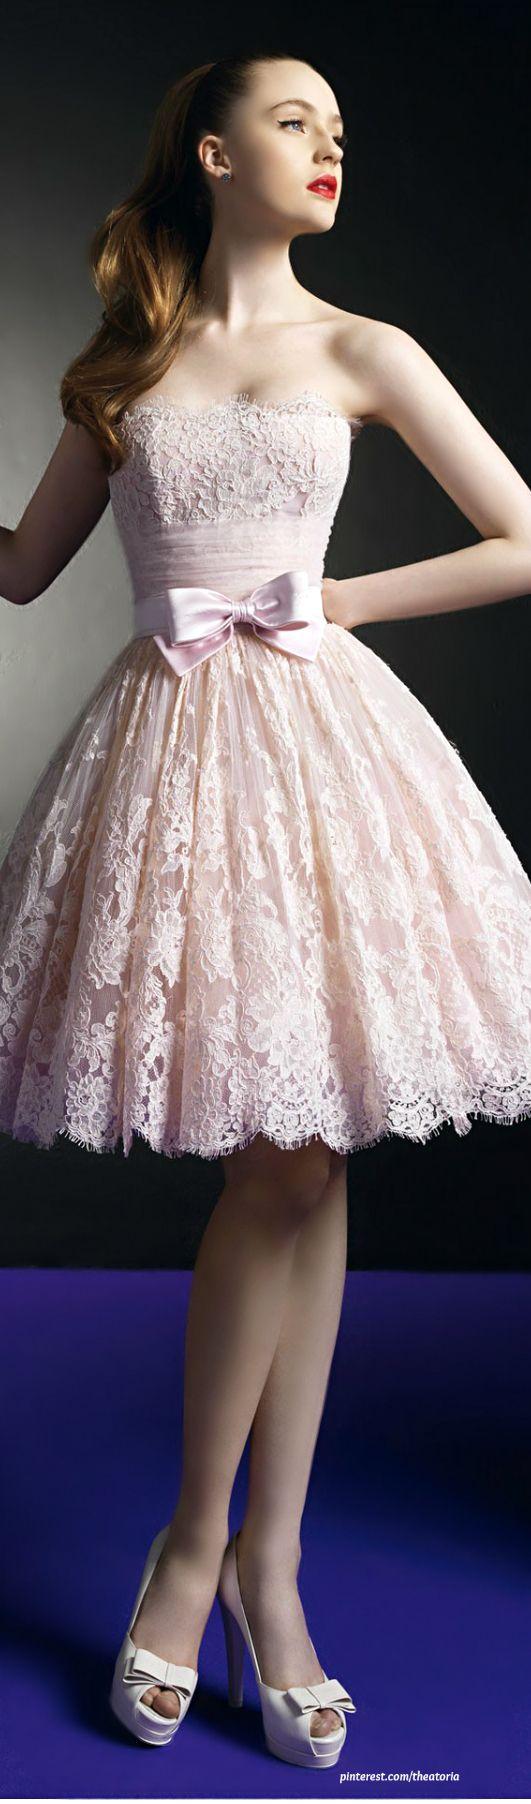 a beautiful lace dress I love it